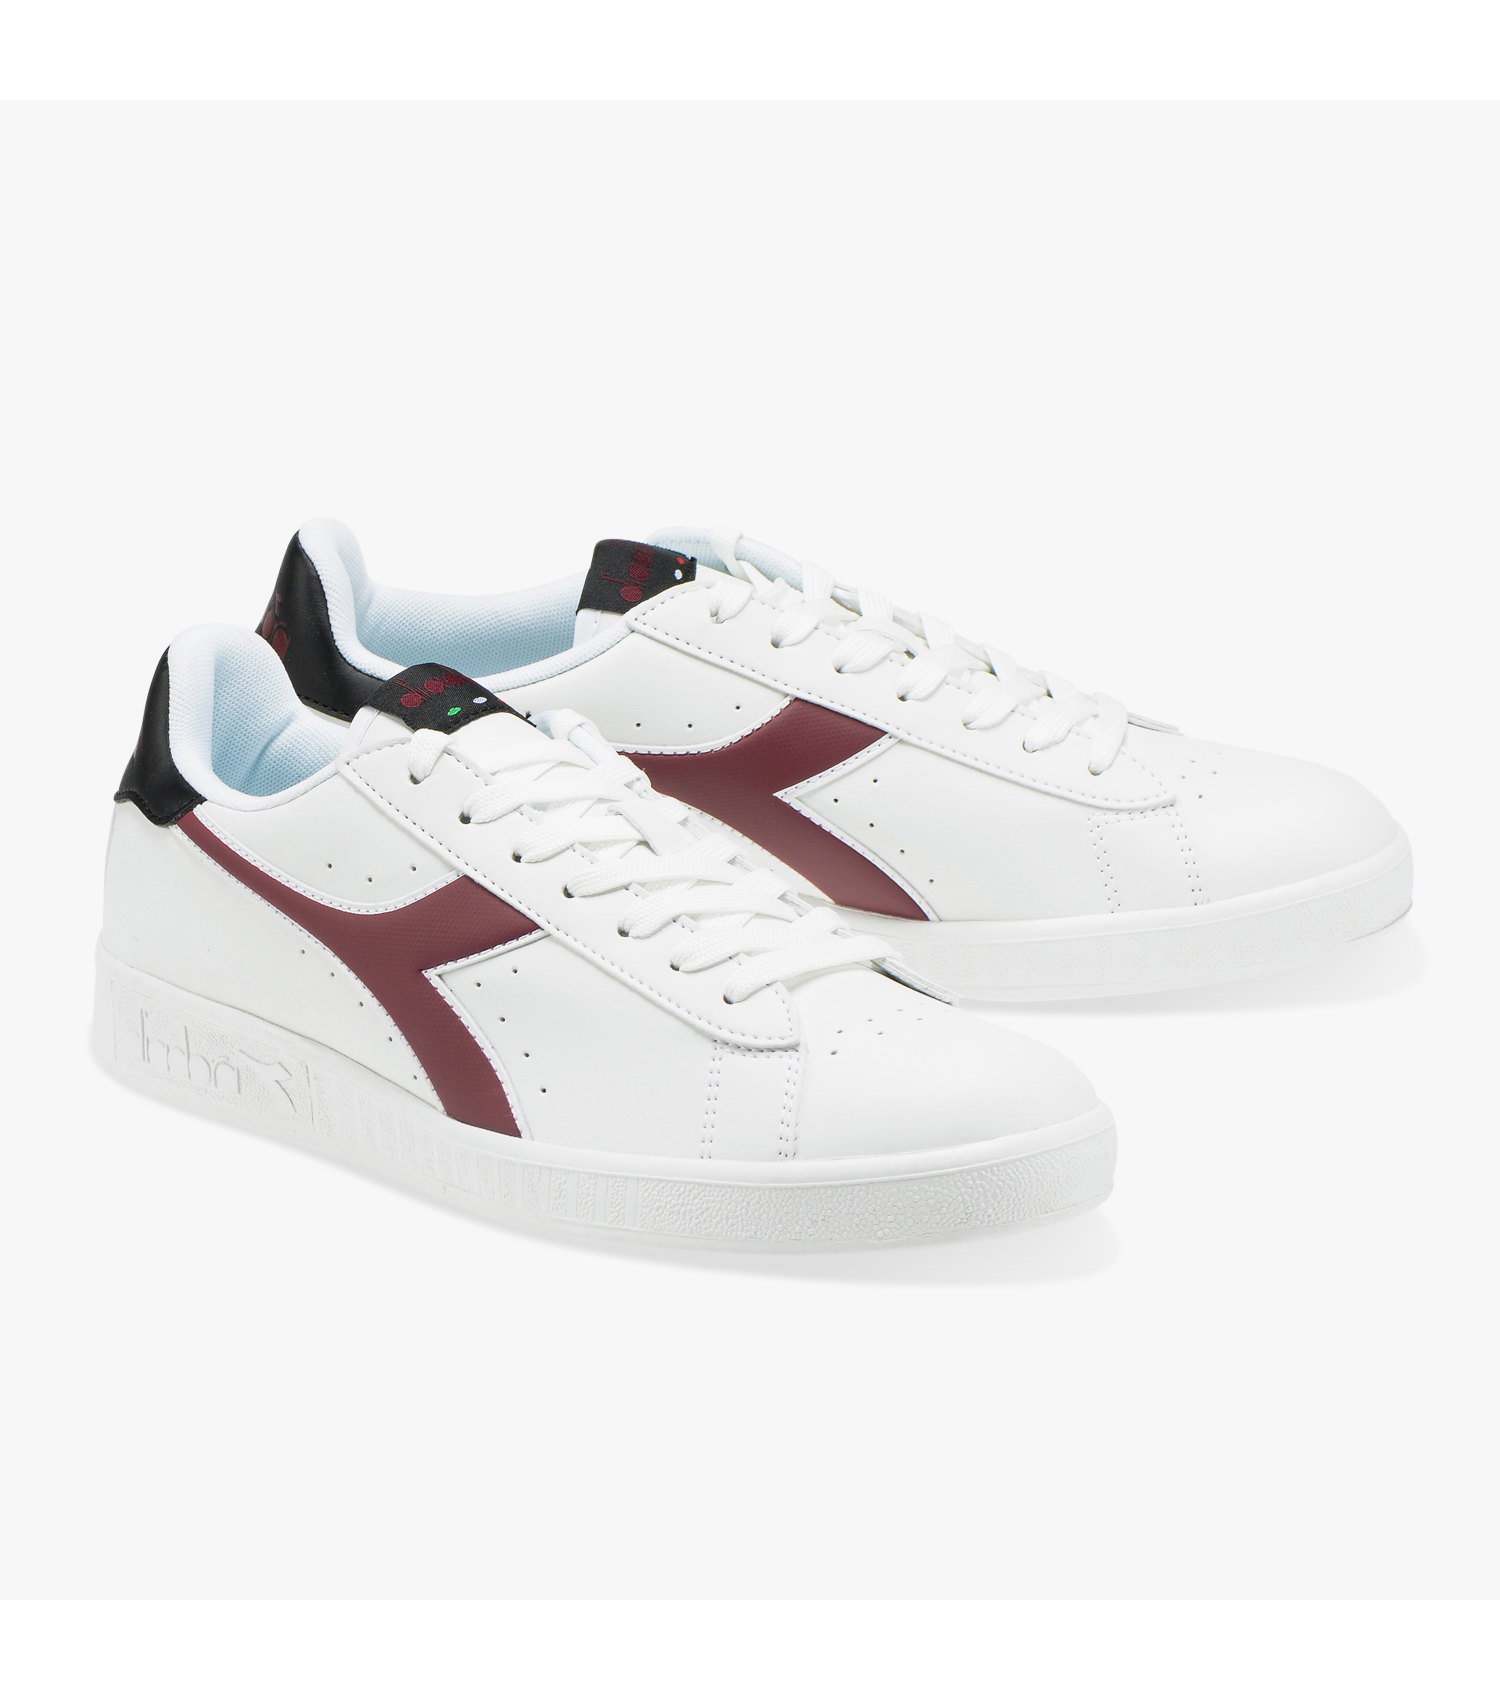 Diadora Sport Schuhe Sneakers Shoe GBME P C7609 Weiss Sportswear Lifestyle